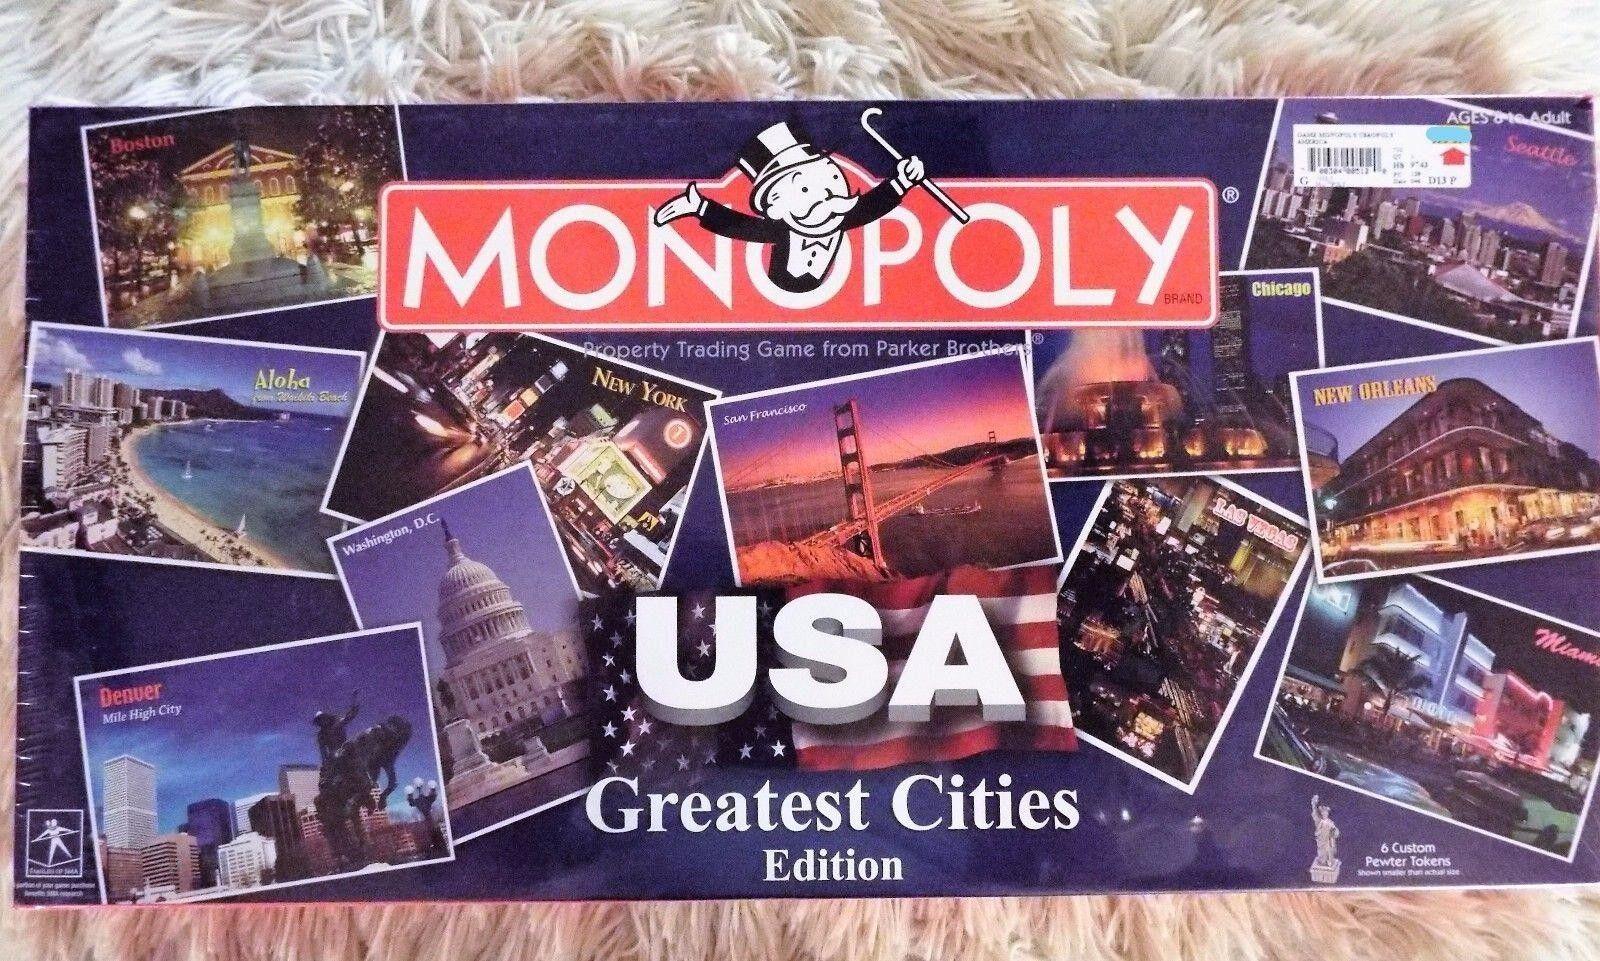 MONOPOLY USA Greatest Cities Edition, 2005 USAopoly, HASBRO, MIB